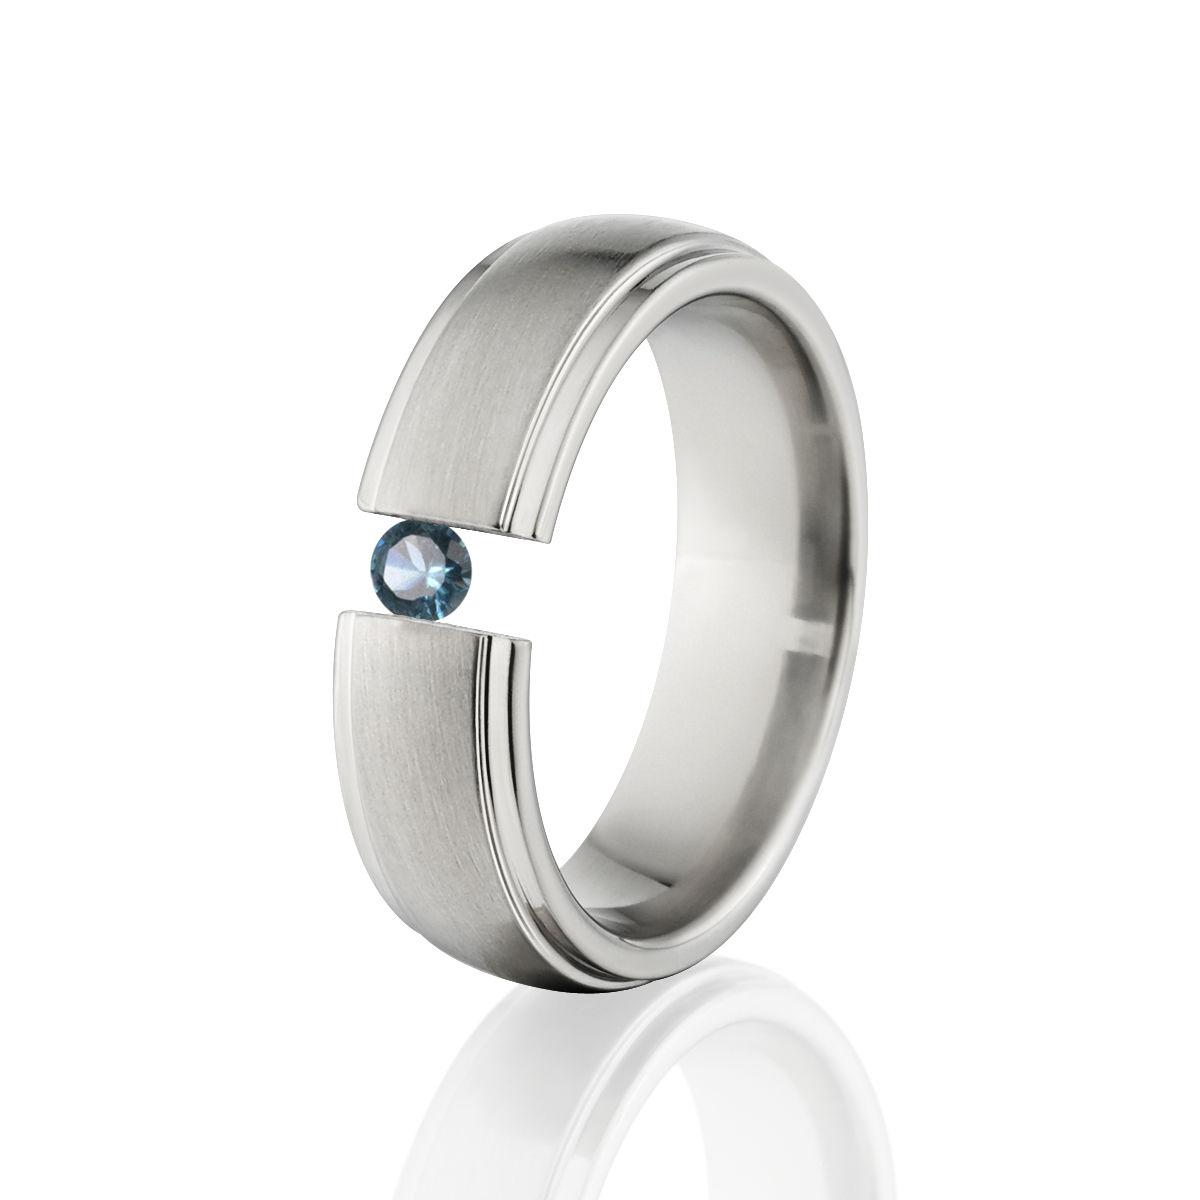 Blue Topaz Tension Set Ring, 7mm Blue Topaz Ring, Titanium Ring